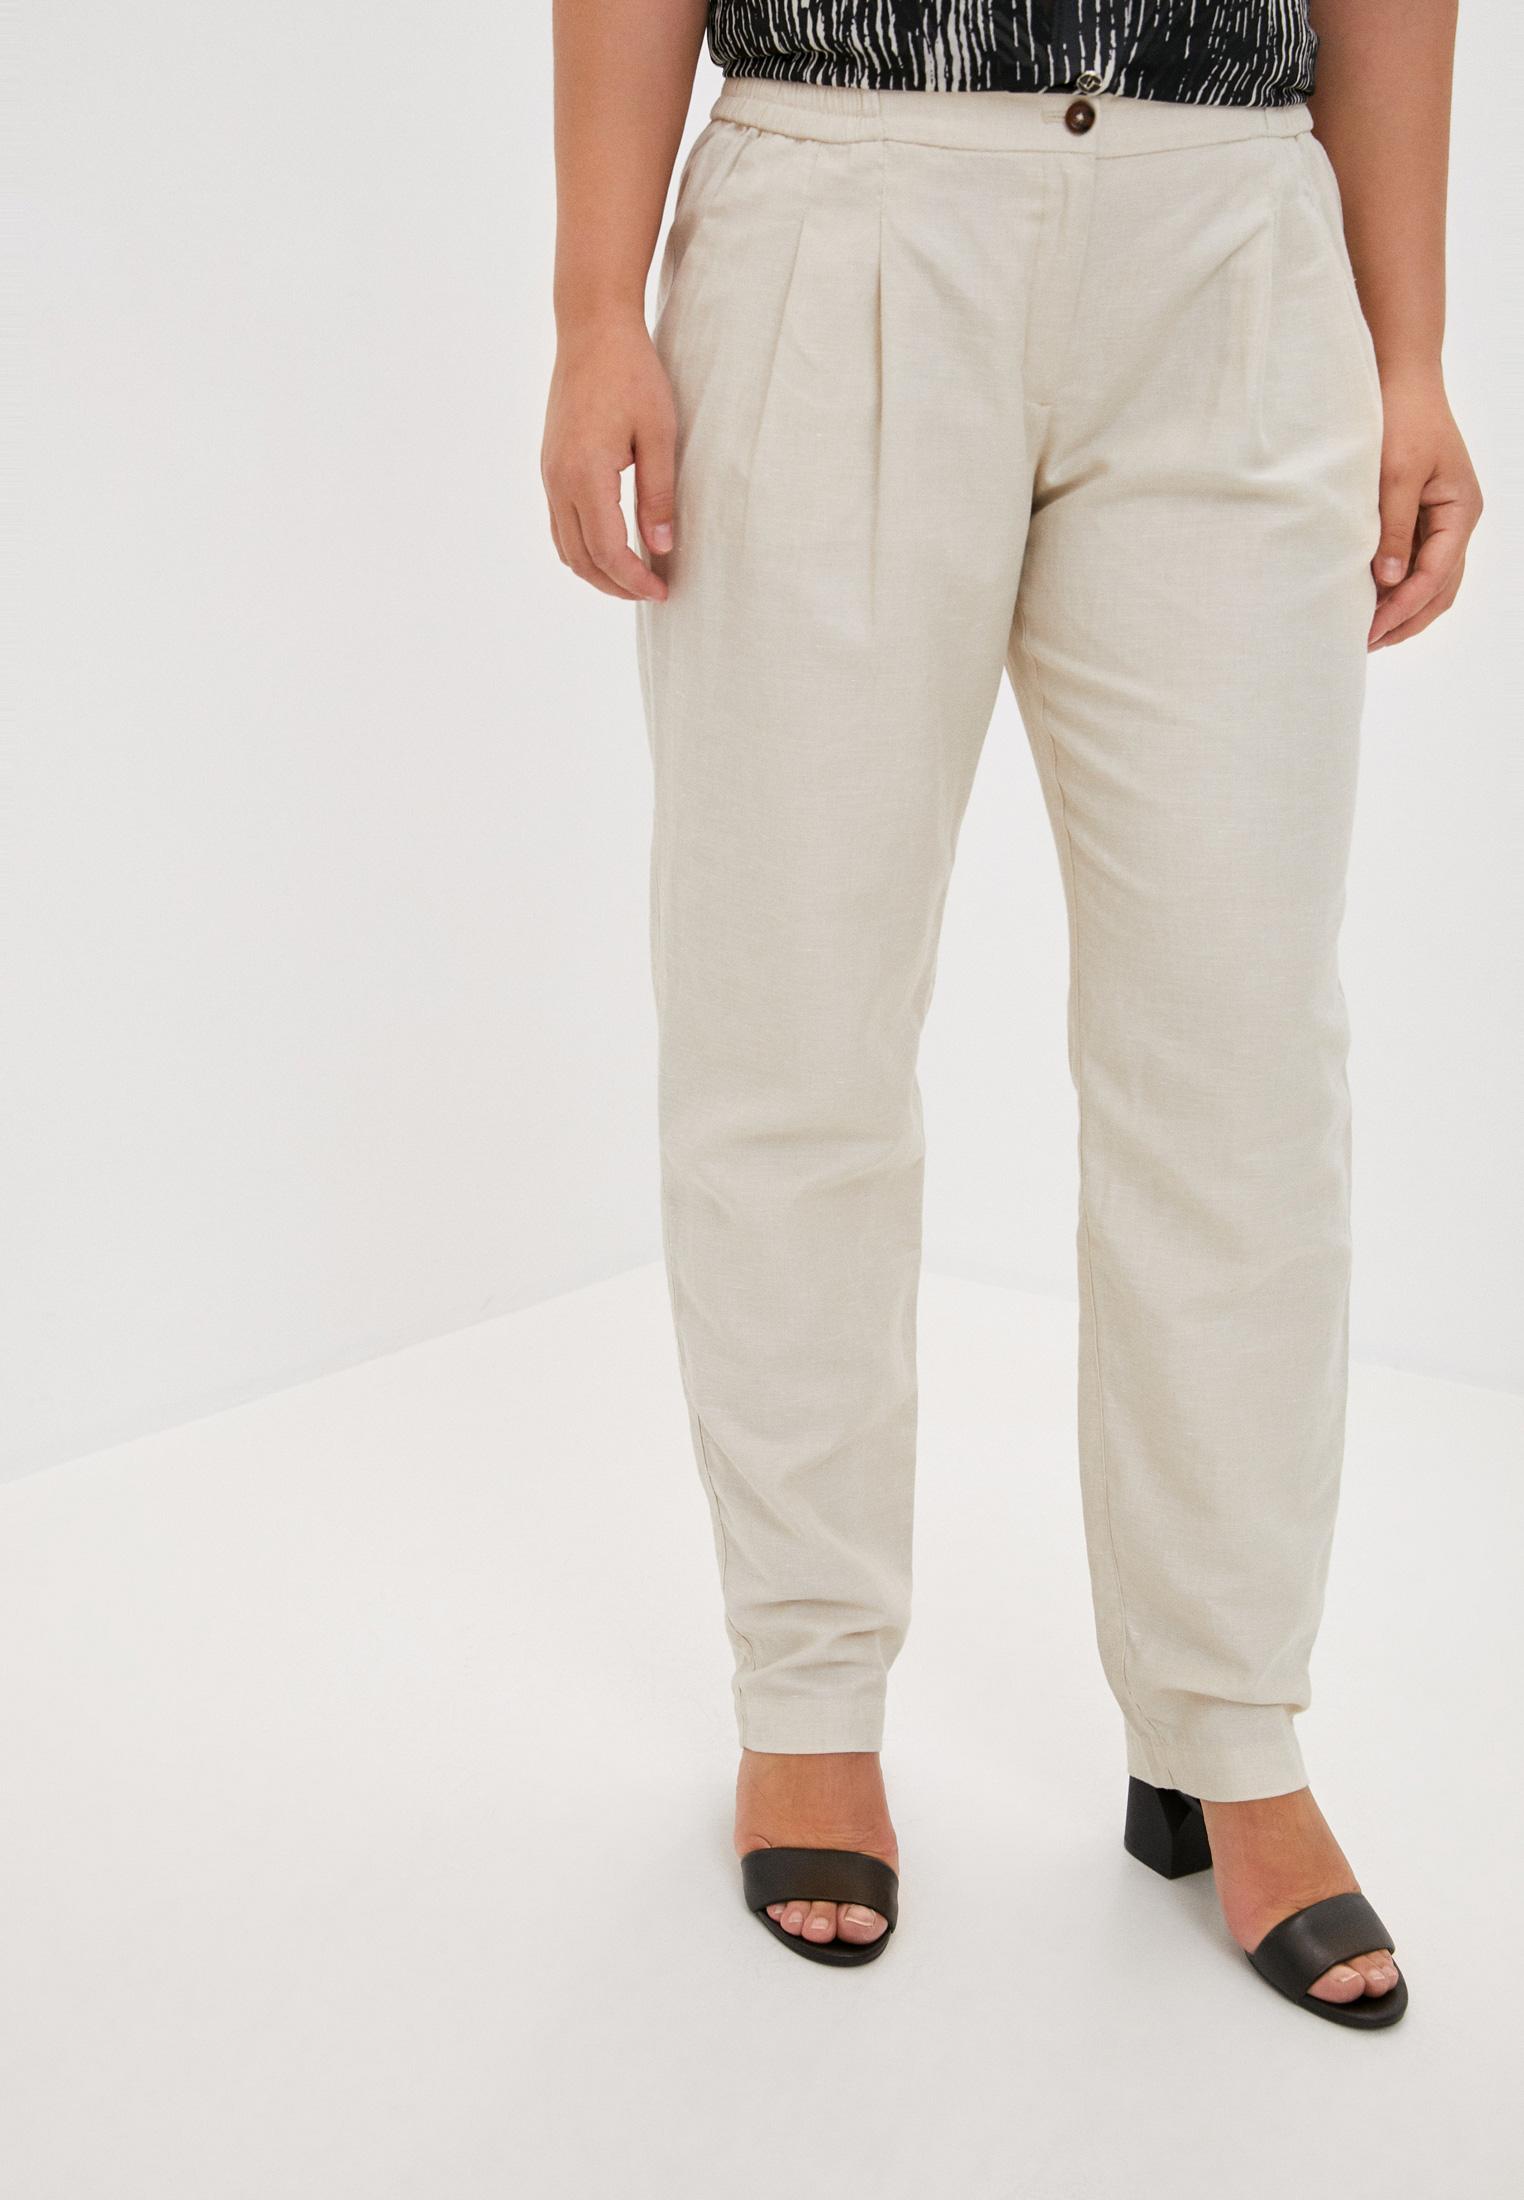 Женские зауженные брюки Finn Flare (Фин Флаер) S19-32025